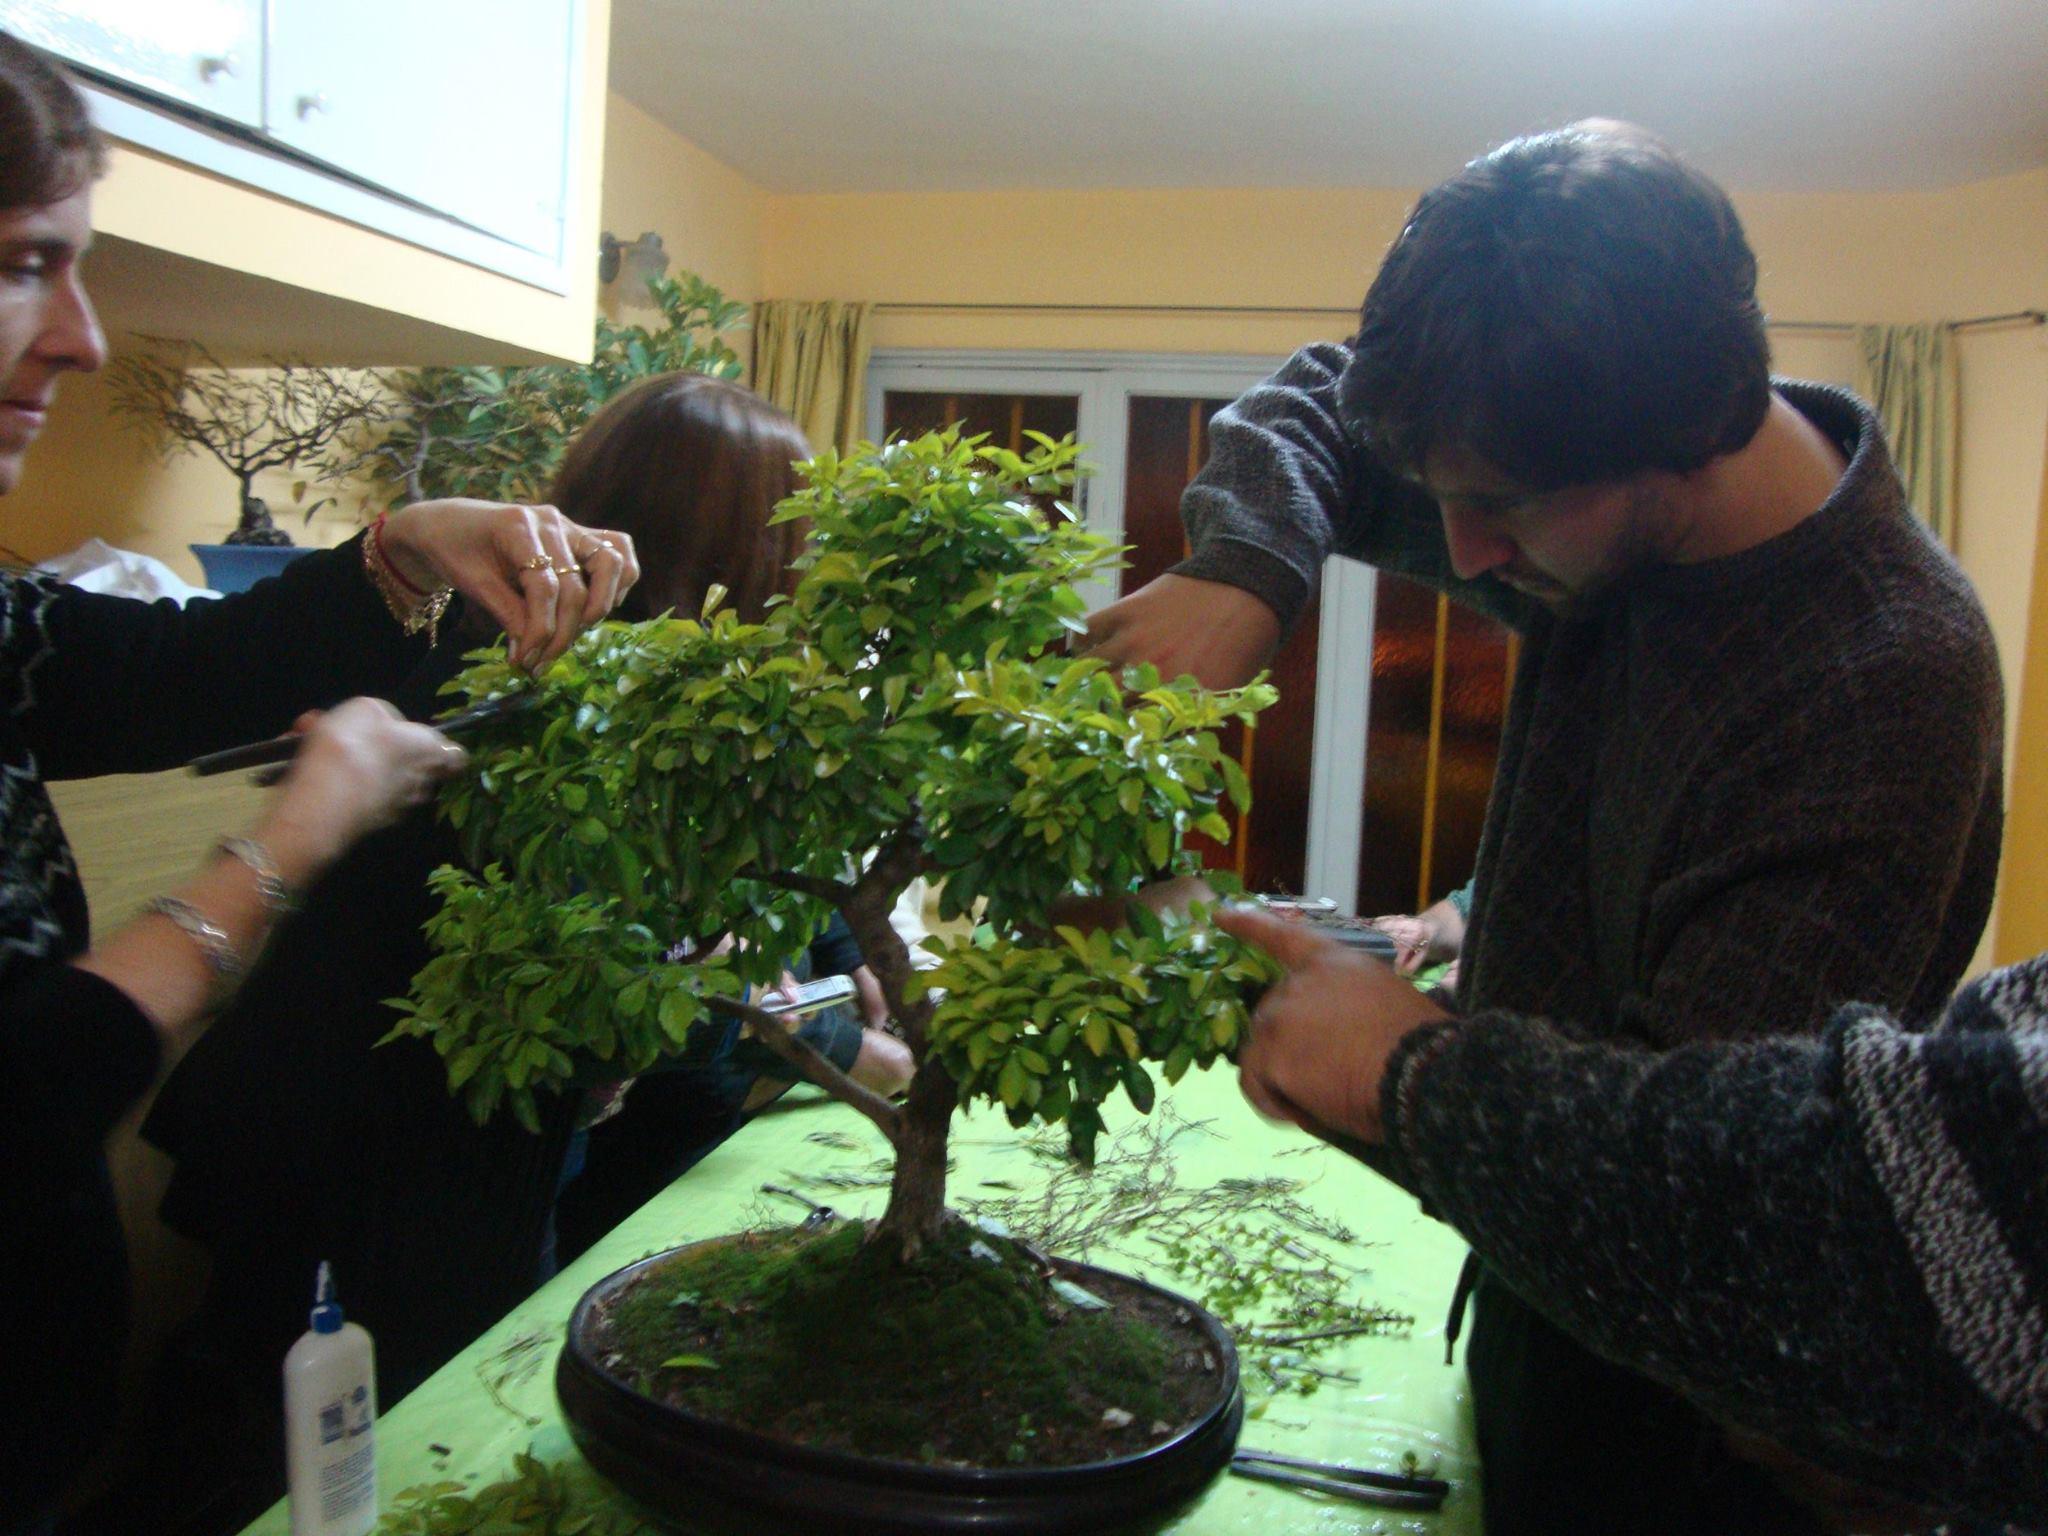 El s bado taller de bons i en el jard n bot nico obere o for Talleres jardin botanico